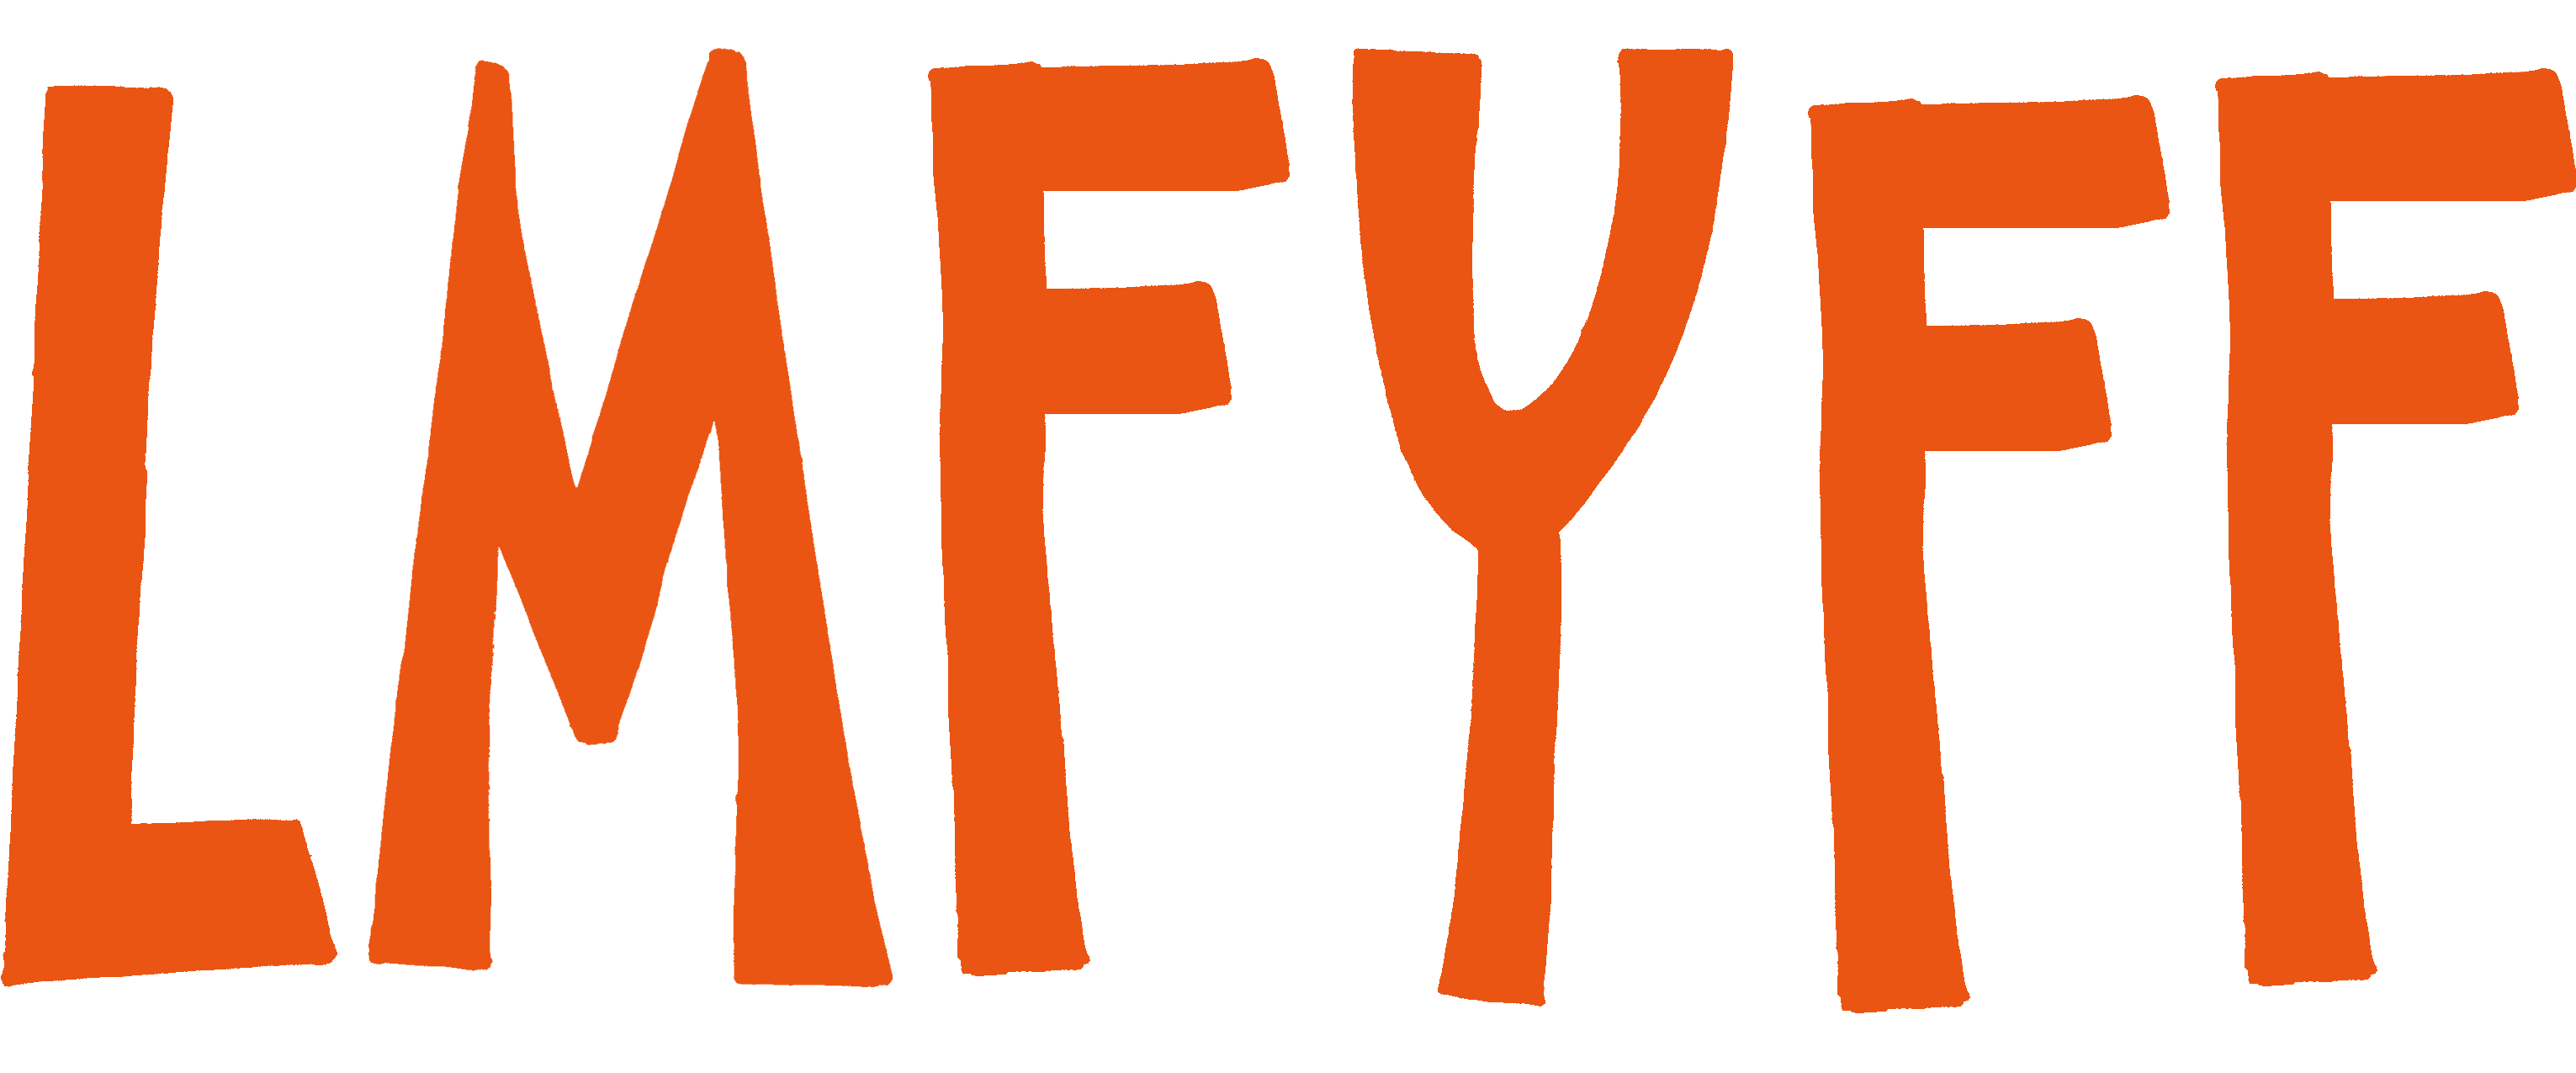 LMFYFF Productions